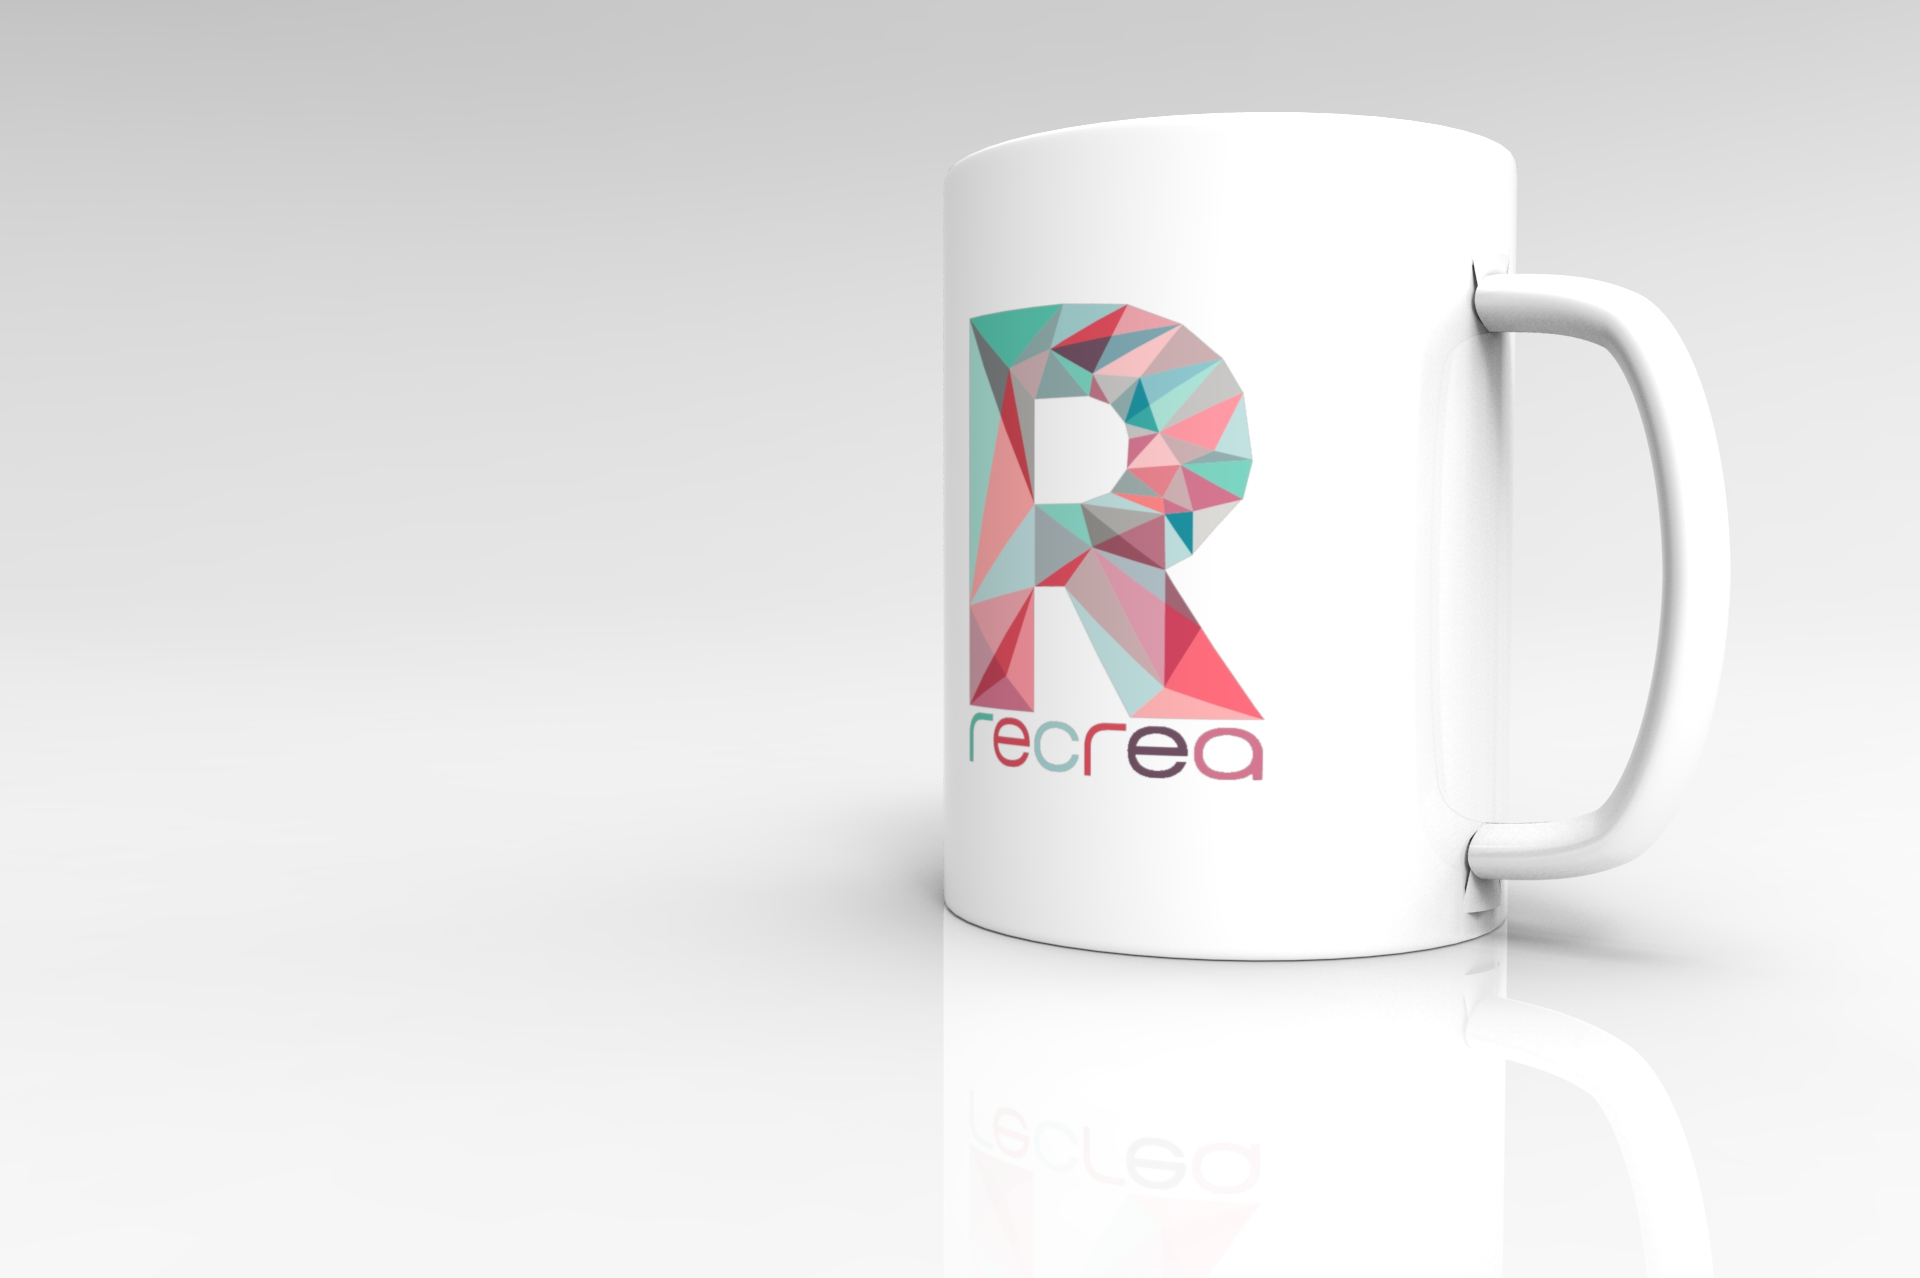 recrea 3